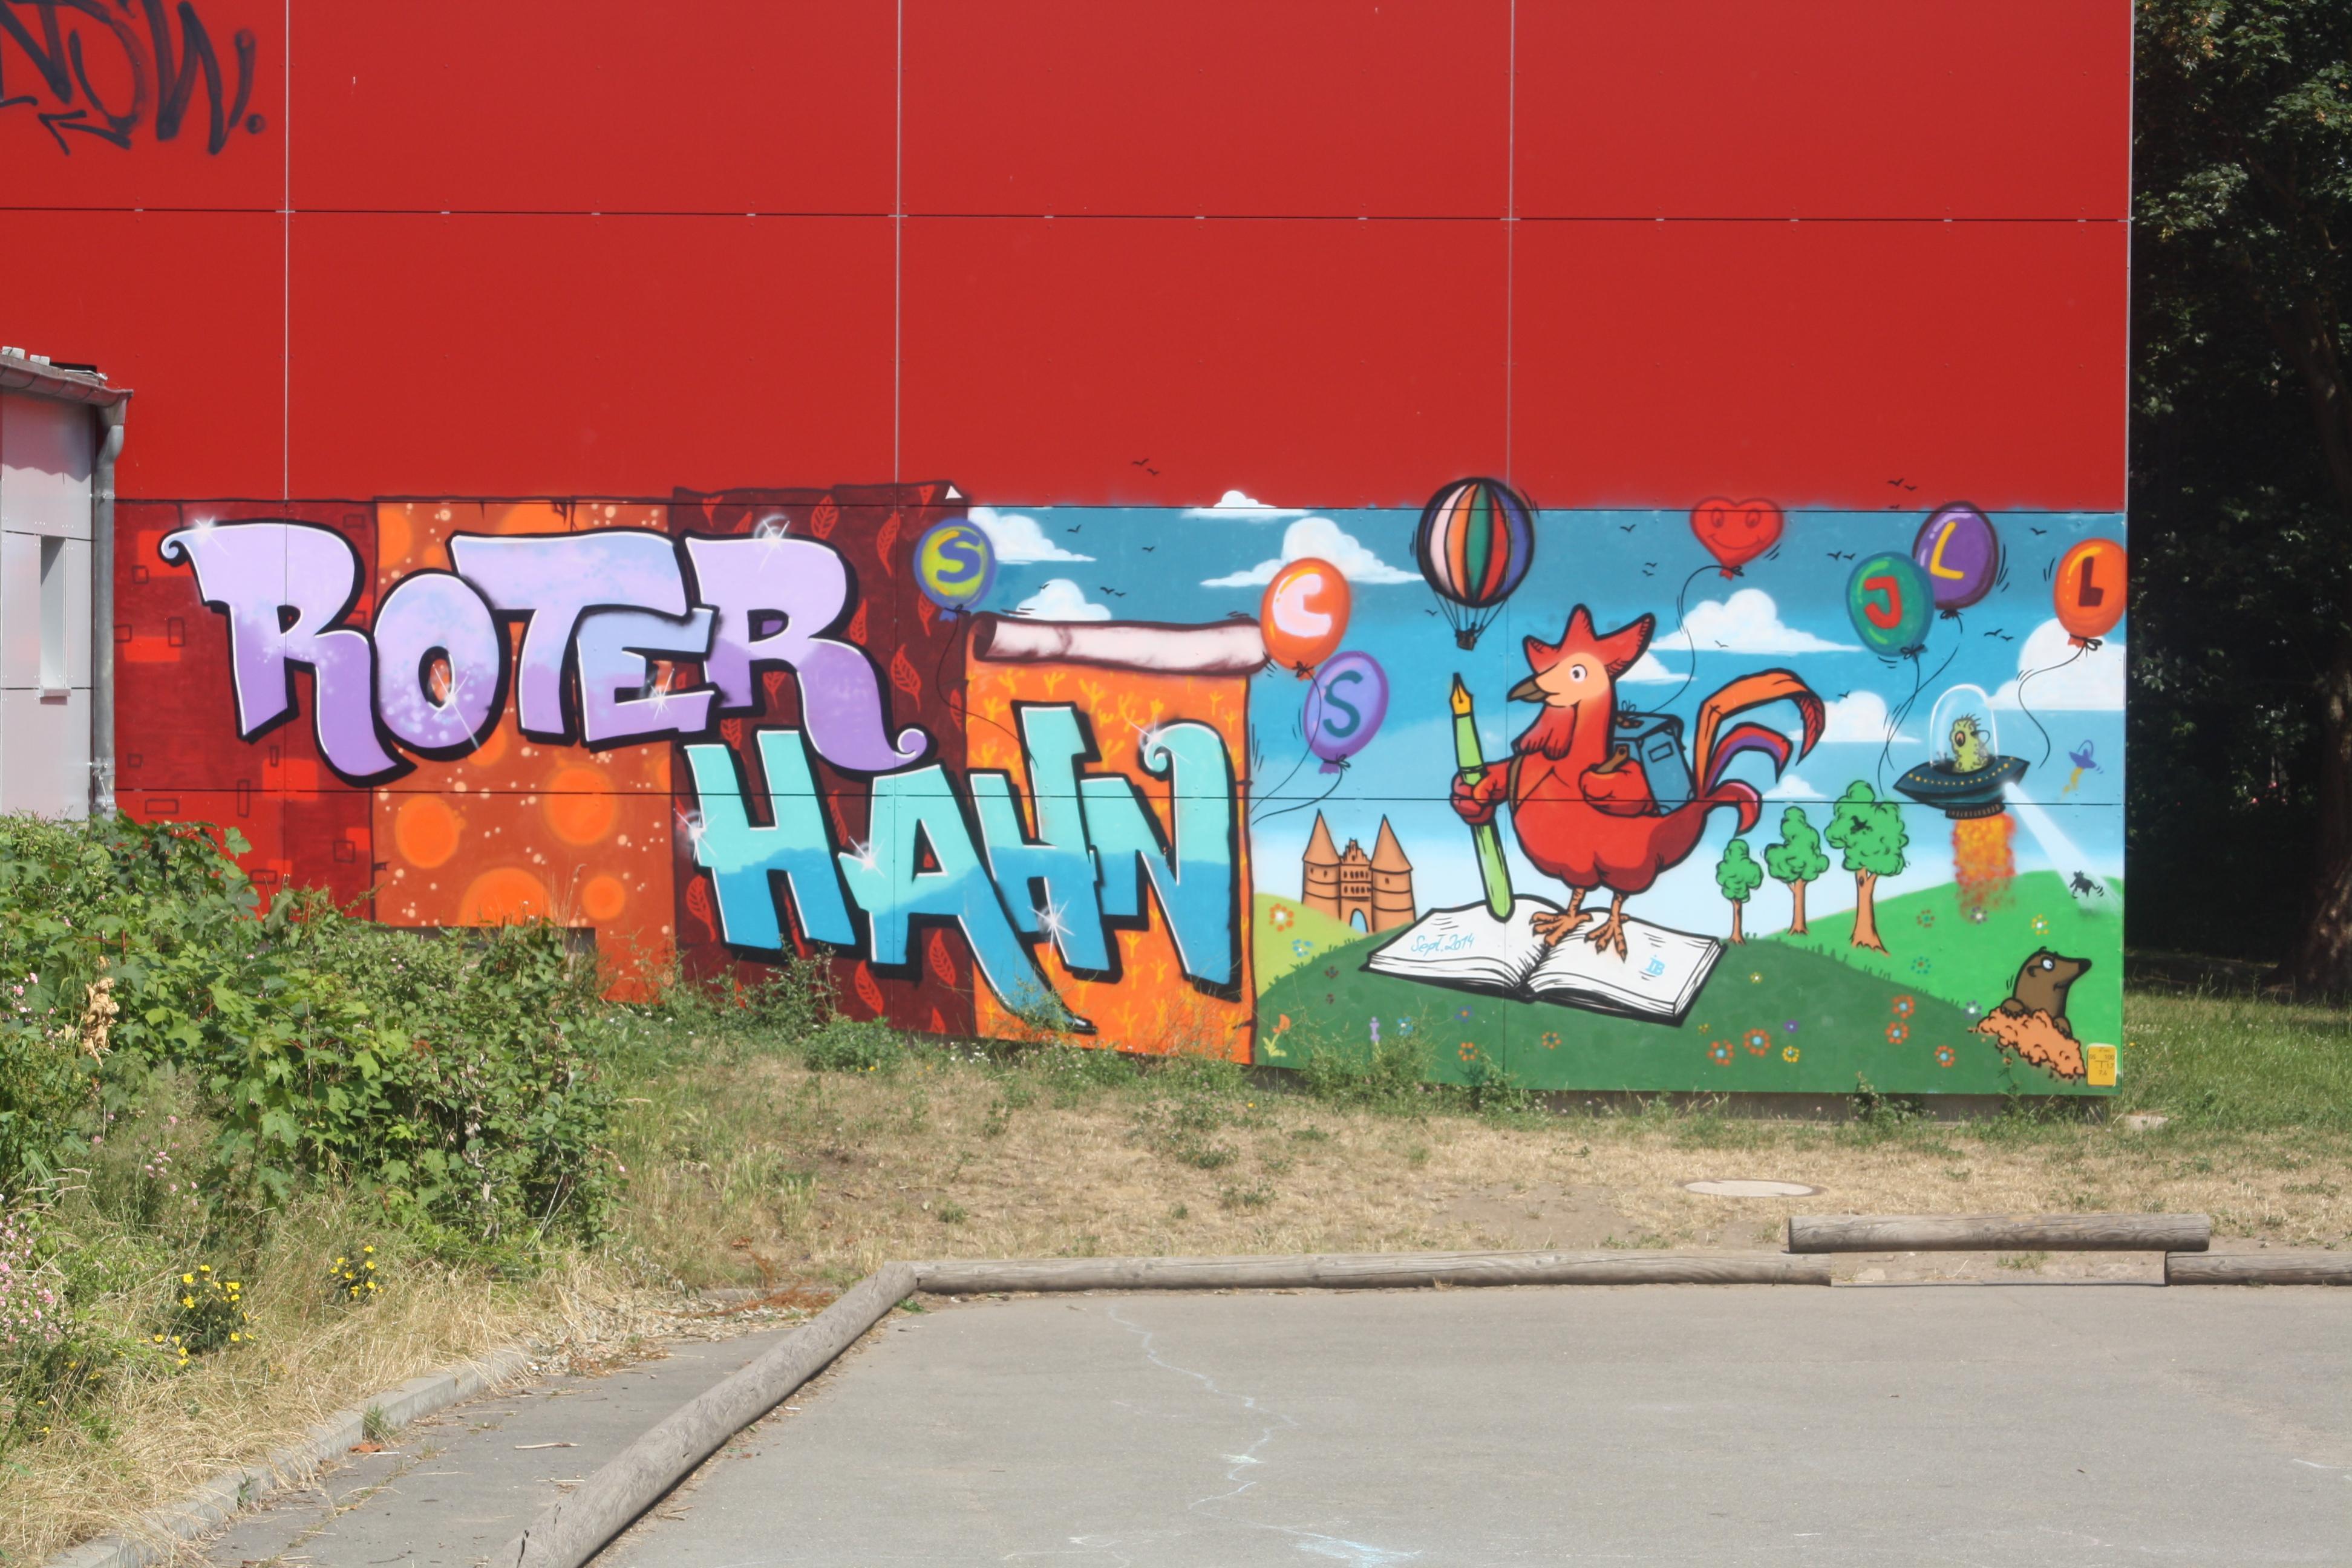 Roter Hahn Kunst grundschule roter hahn